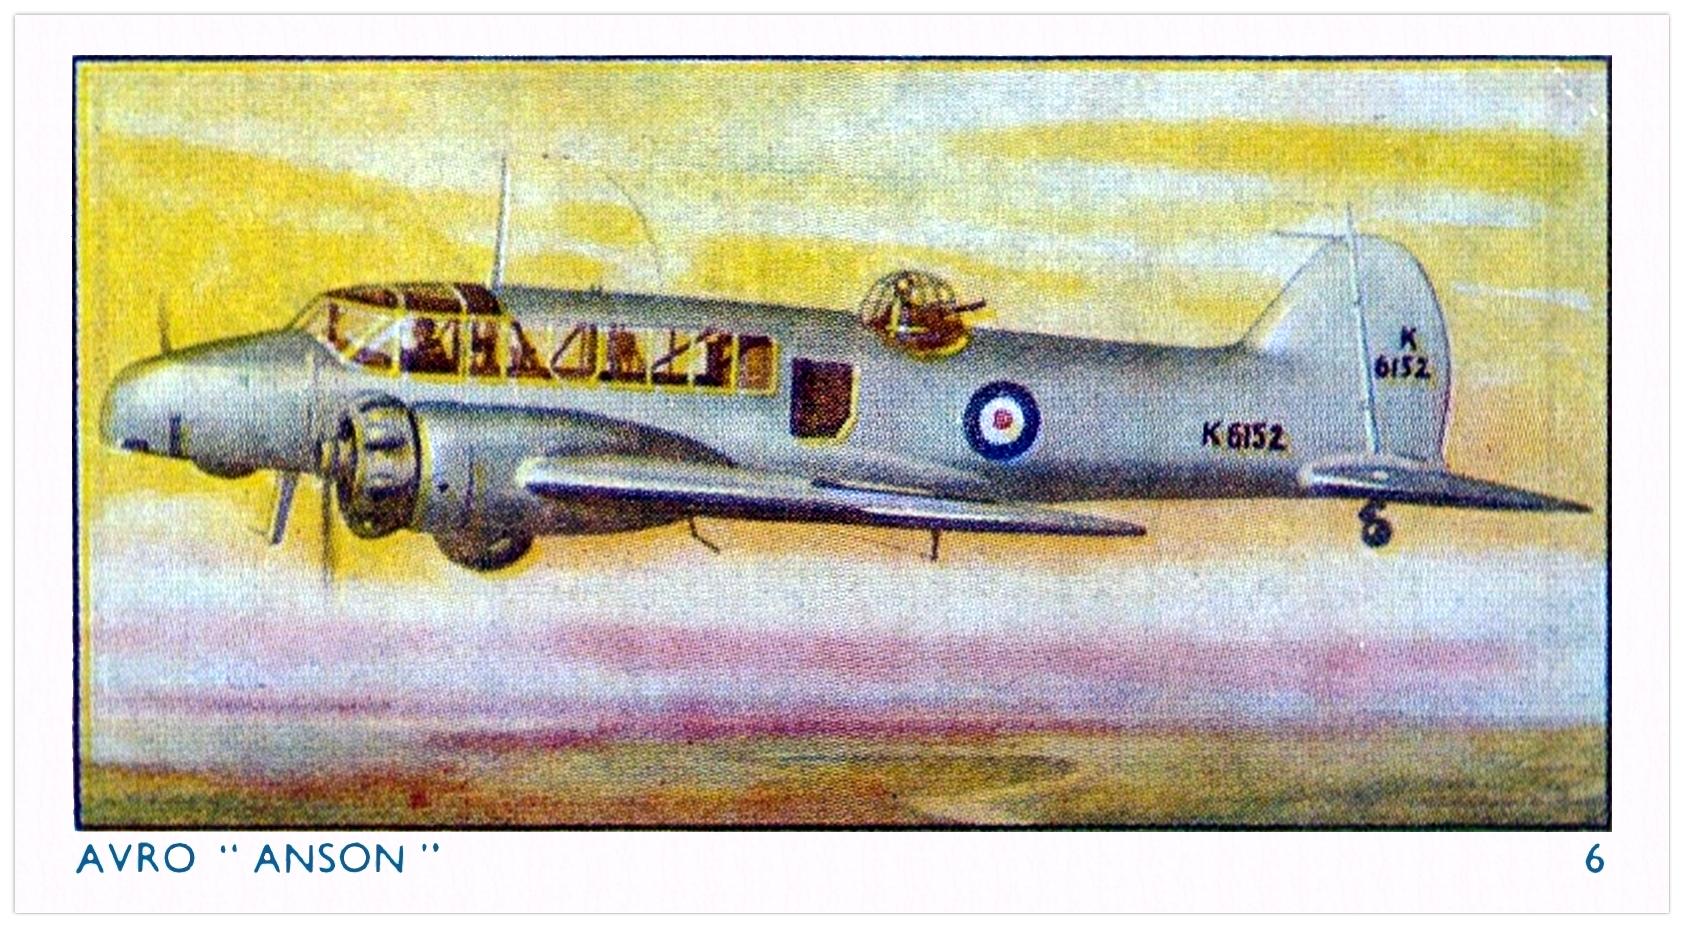 Avro 652A Anson Mk I twin-engine advanced training monoplane